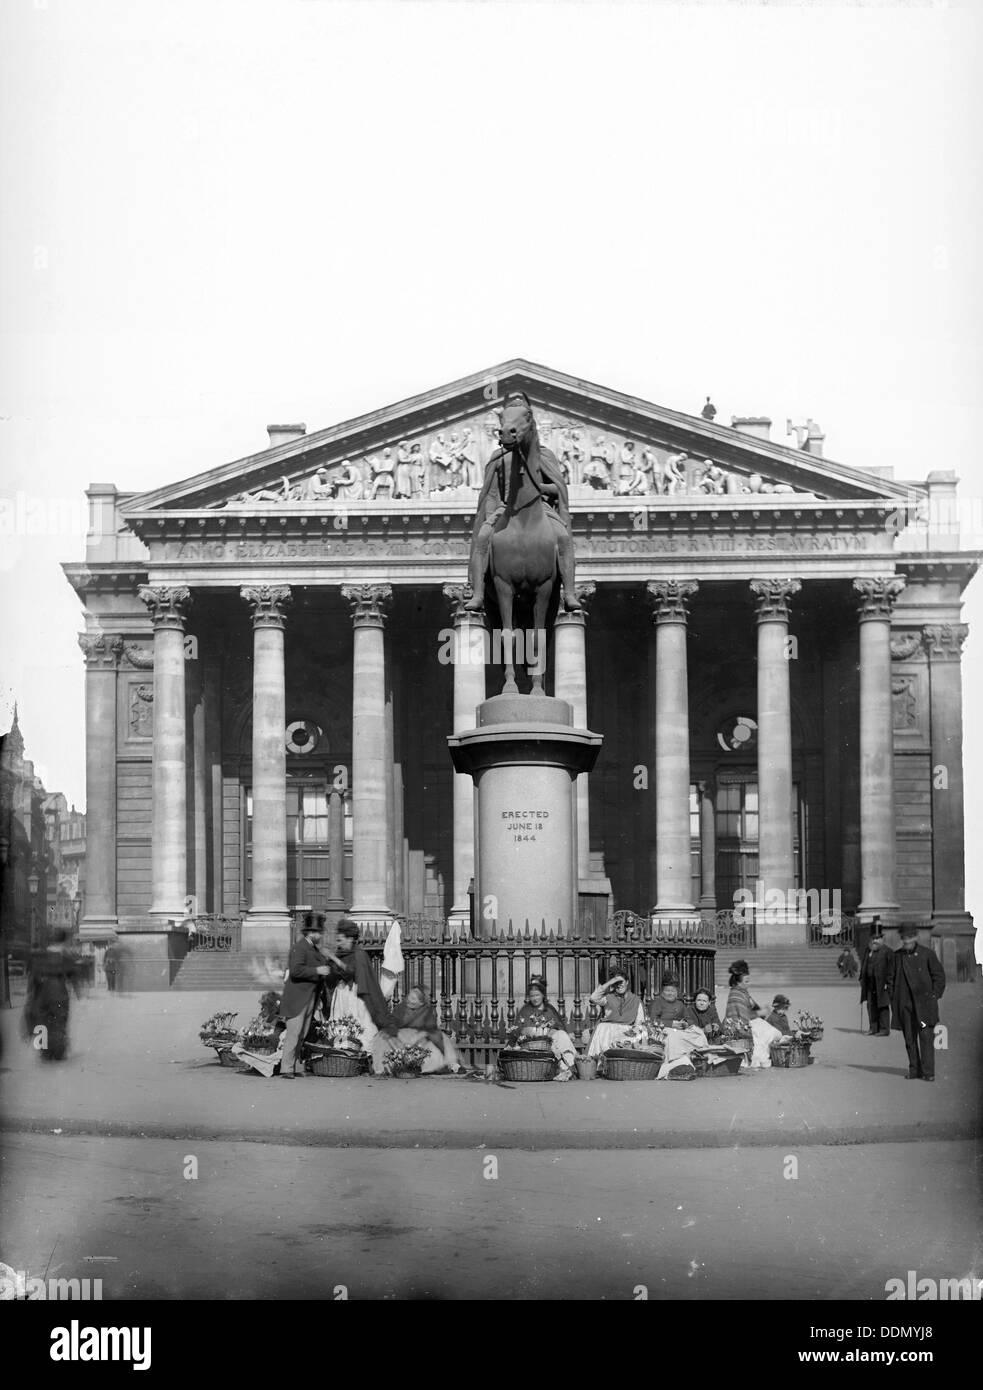 The Royal Exchange, Threadneedle Street, London, c1870-c1900. Artist: York & Son - Stock Image